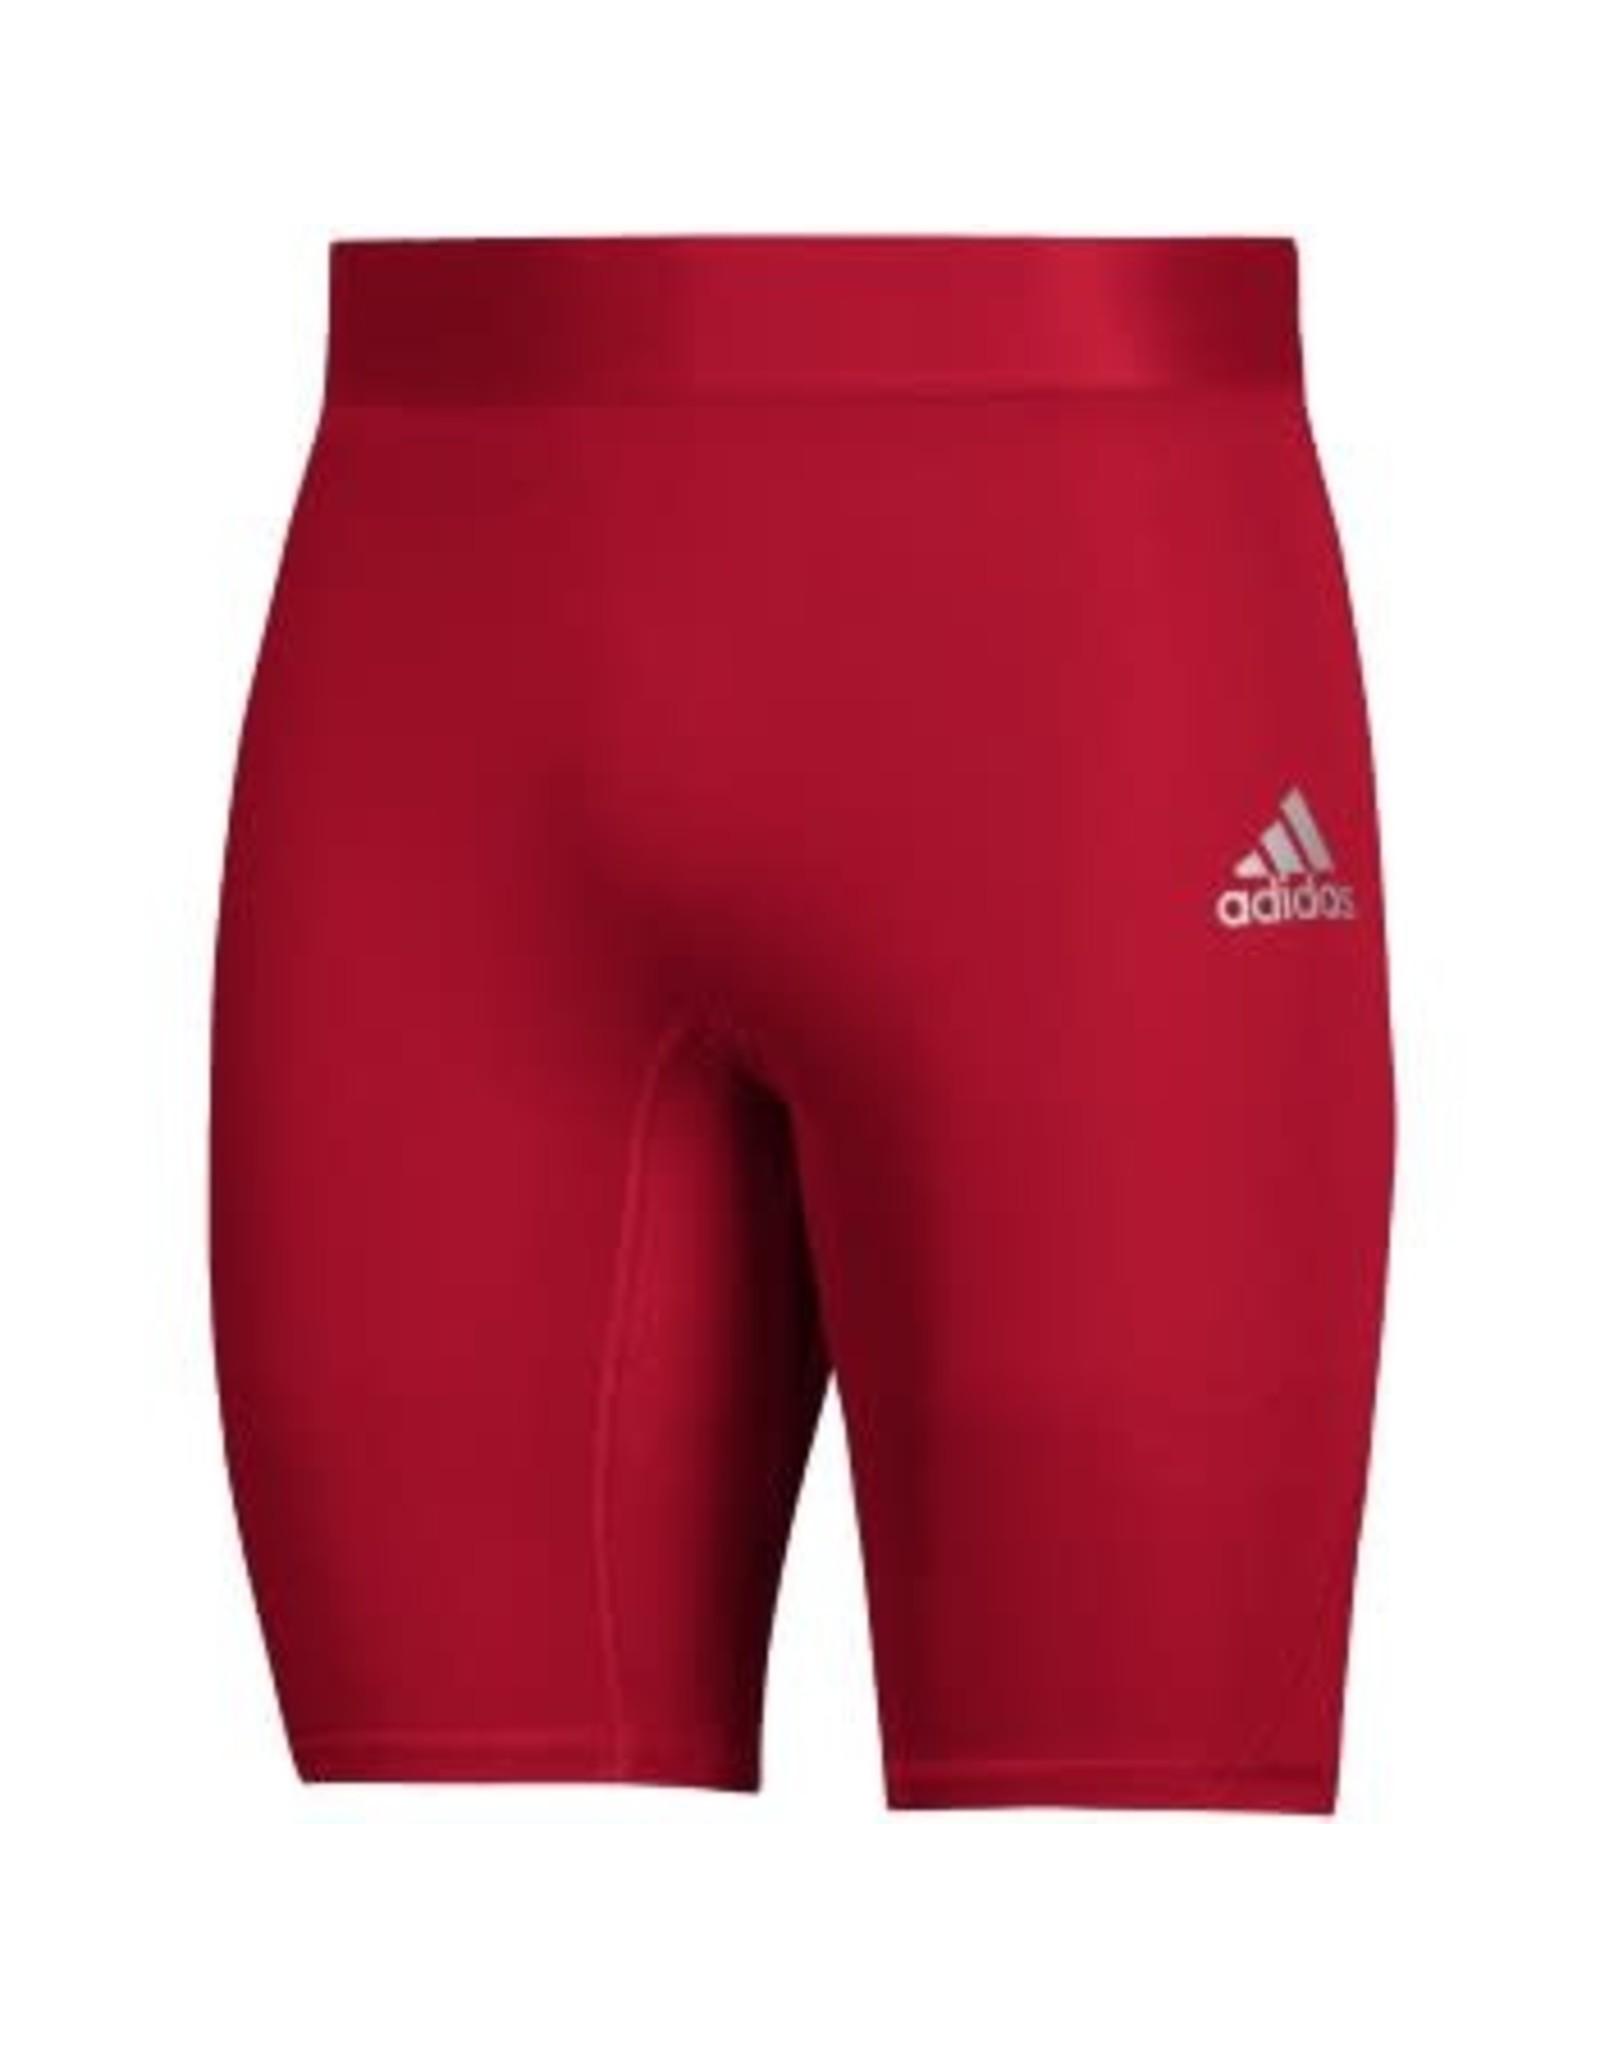 Adidas ADIDAS ALPHA SKN AD SHORT